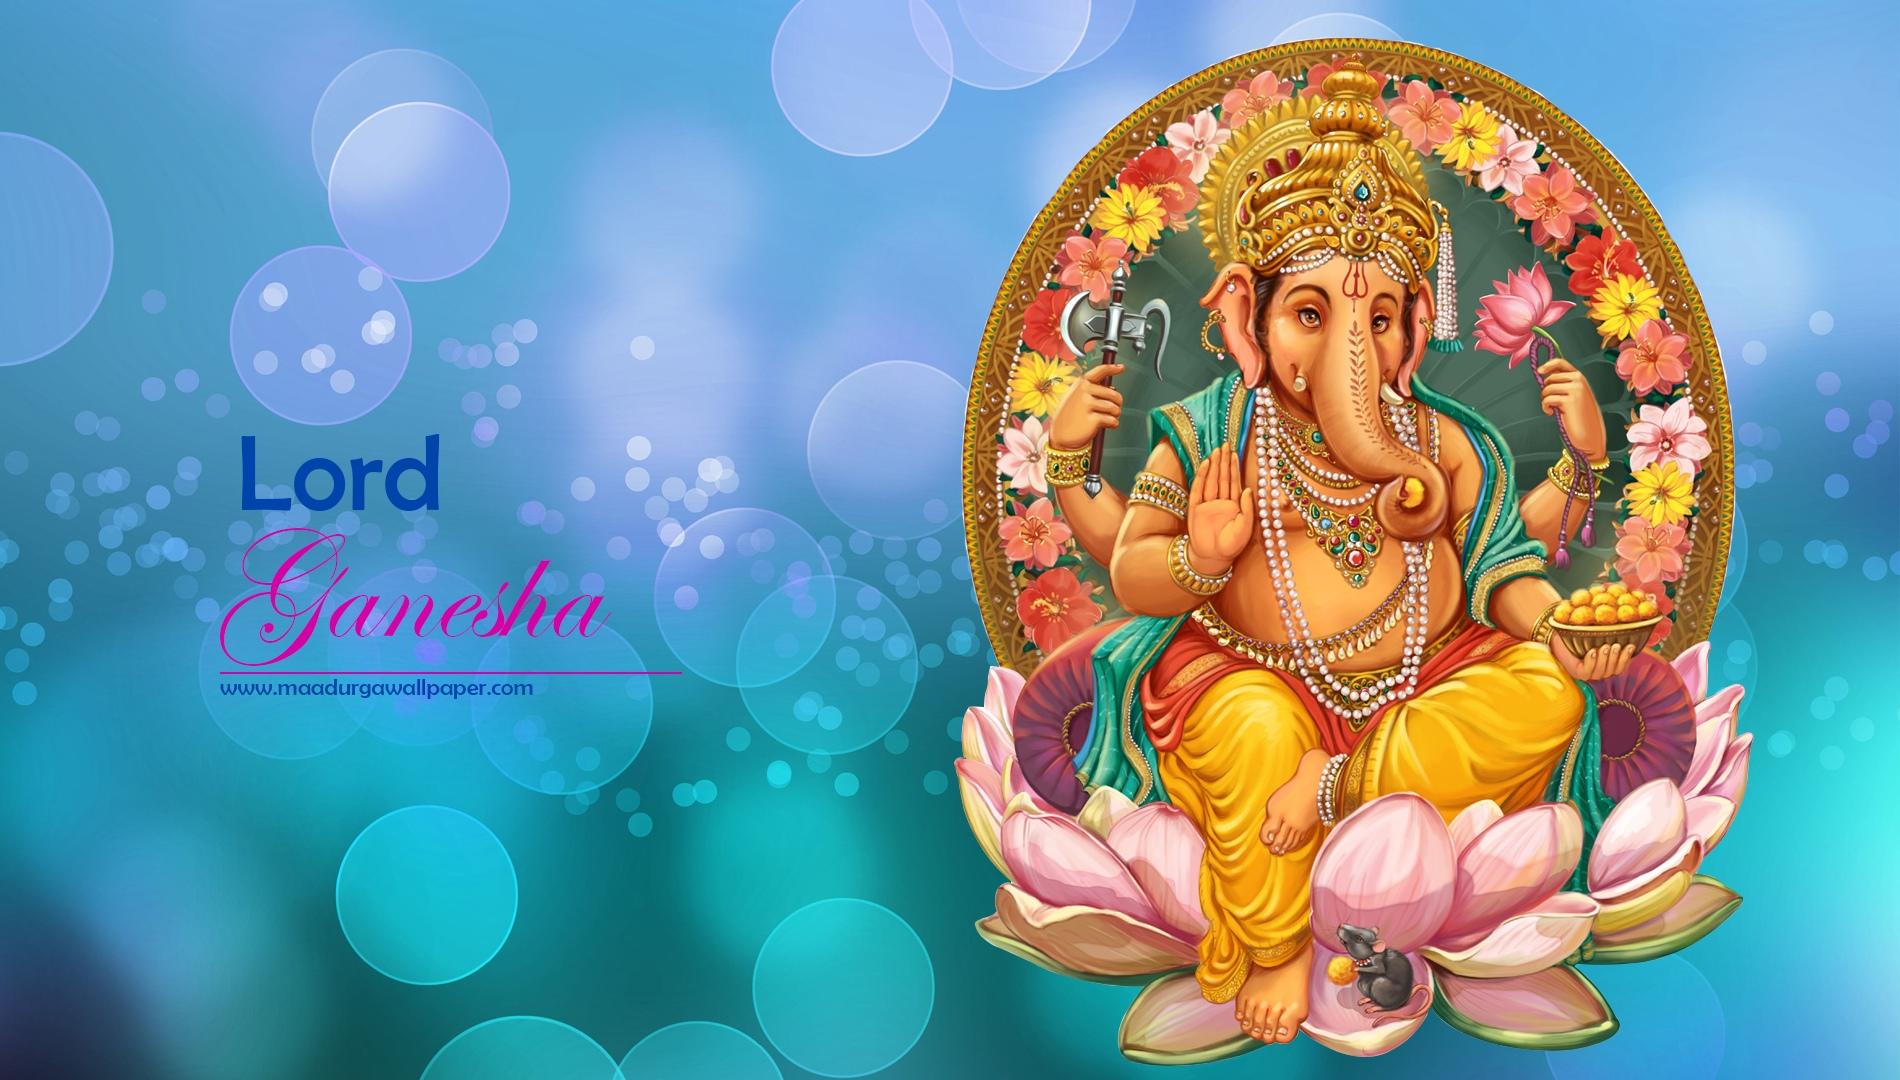 4k Ultra Hd-god - Lord Ganesha Desktop Wallpapers Hd , HD Wallpaper & Backgrounds